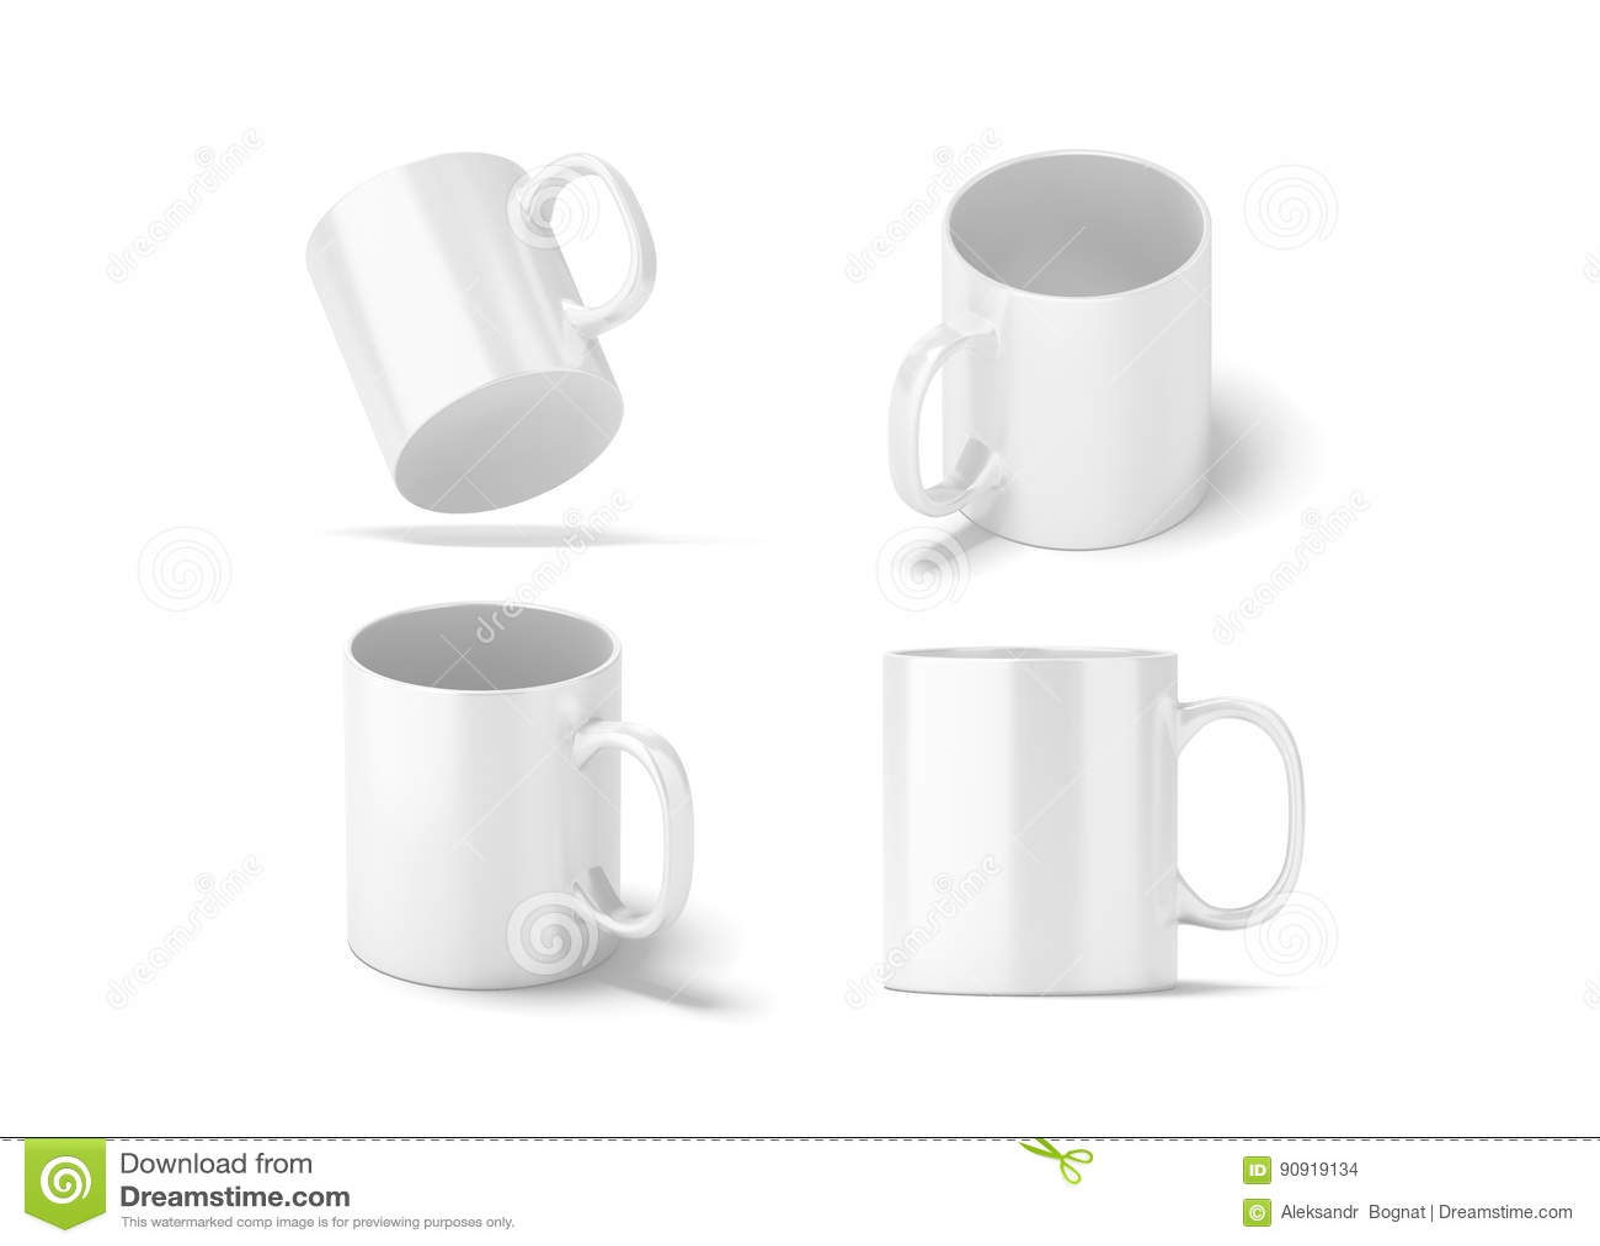 726a5f1e0c7 Blank White Glass Mug Mockups Set Isolated, 3d Rendering. Stock ...